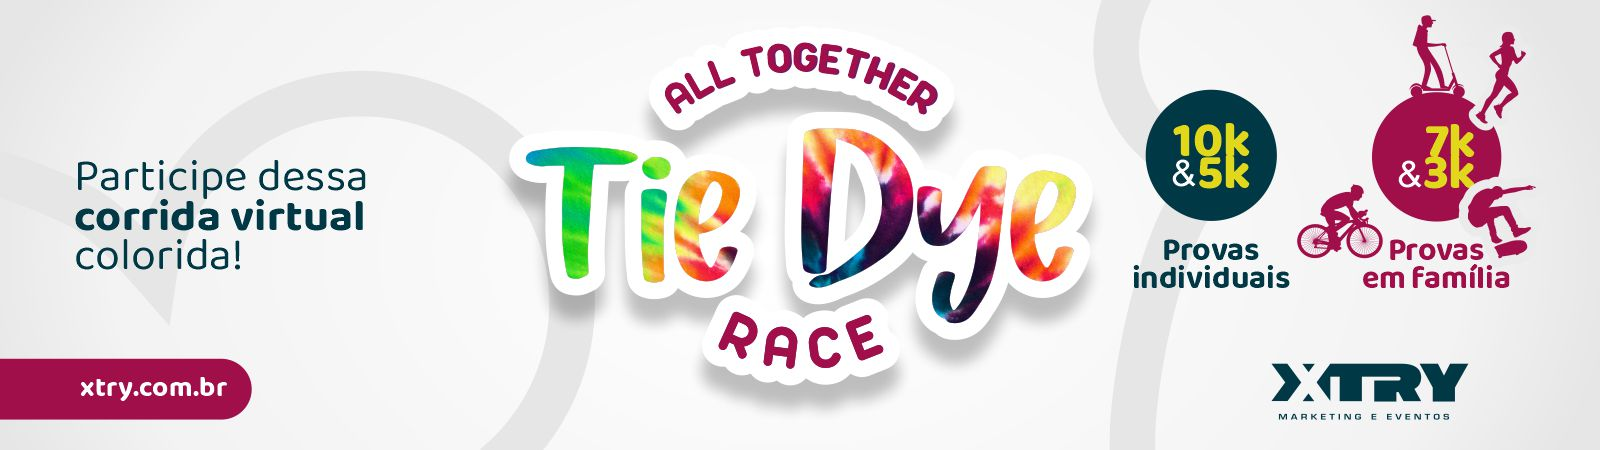 Tie Dye Race - Corrida Virtual Xtry